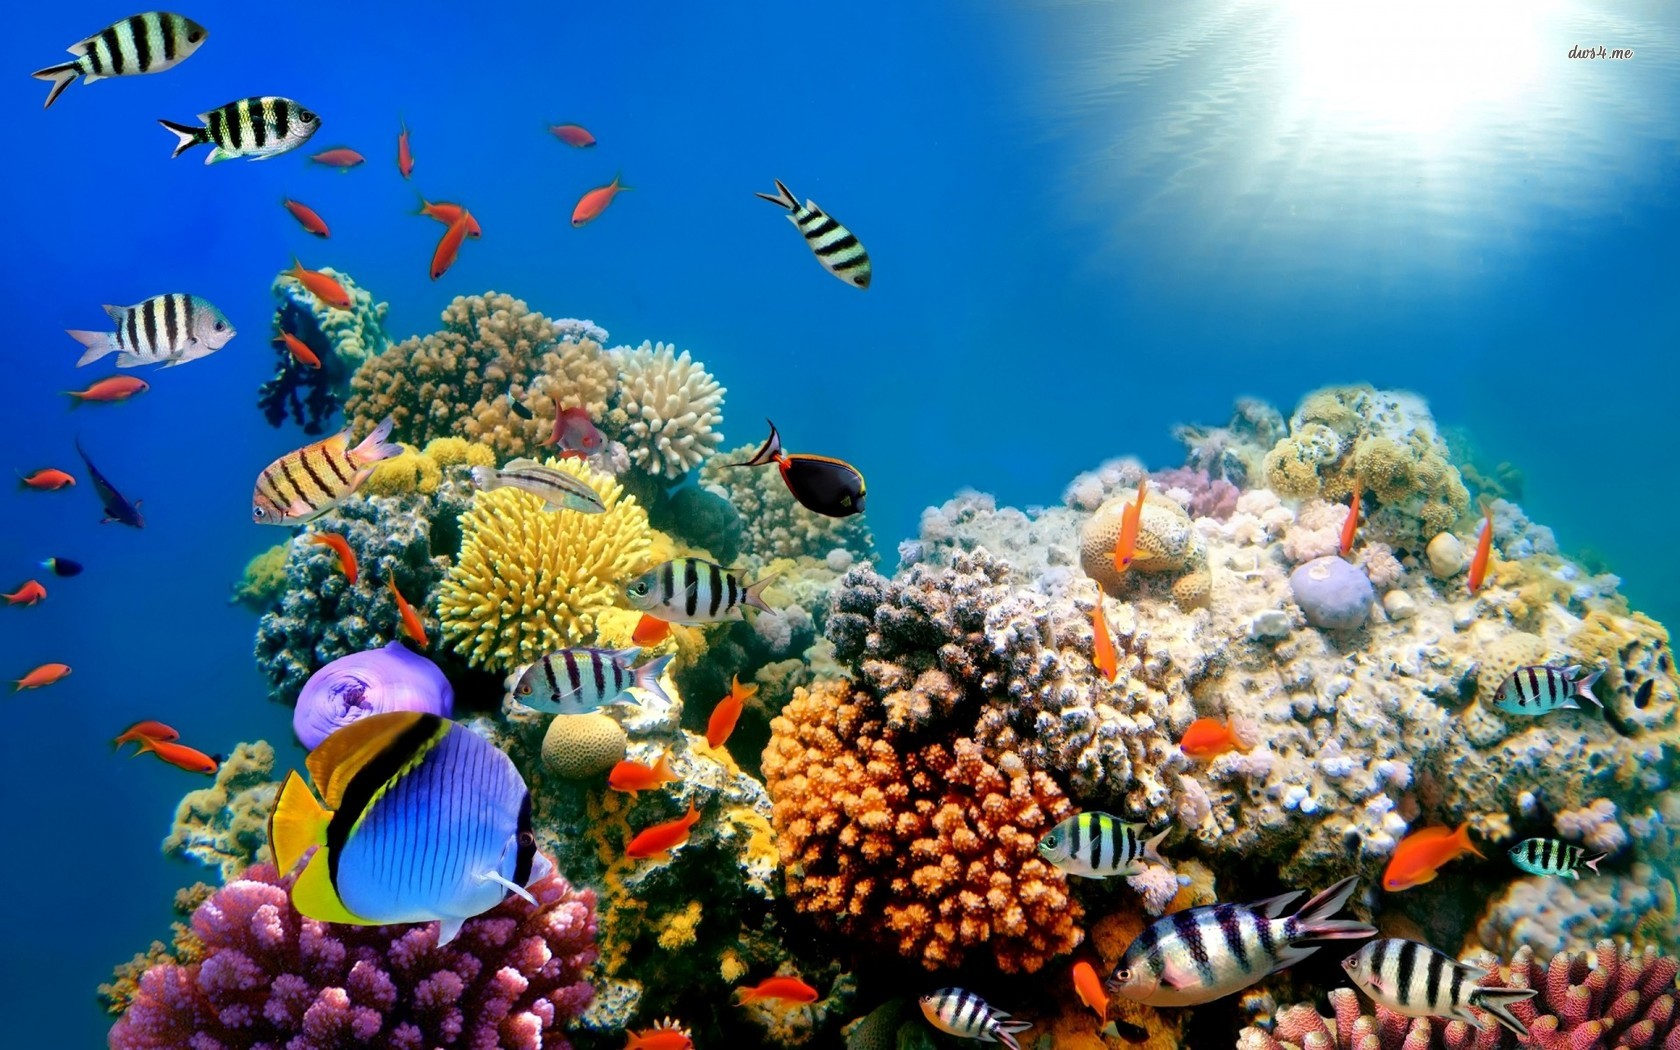 17627 ocean reef 16801050 animal wallpaper seA ANIMALS 1680x1050